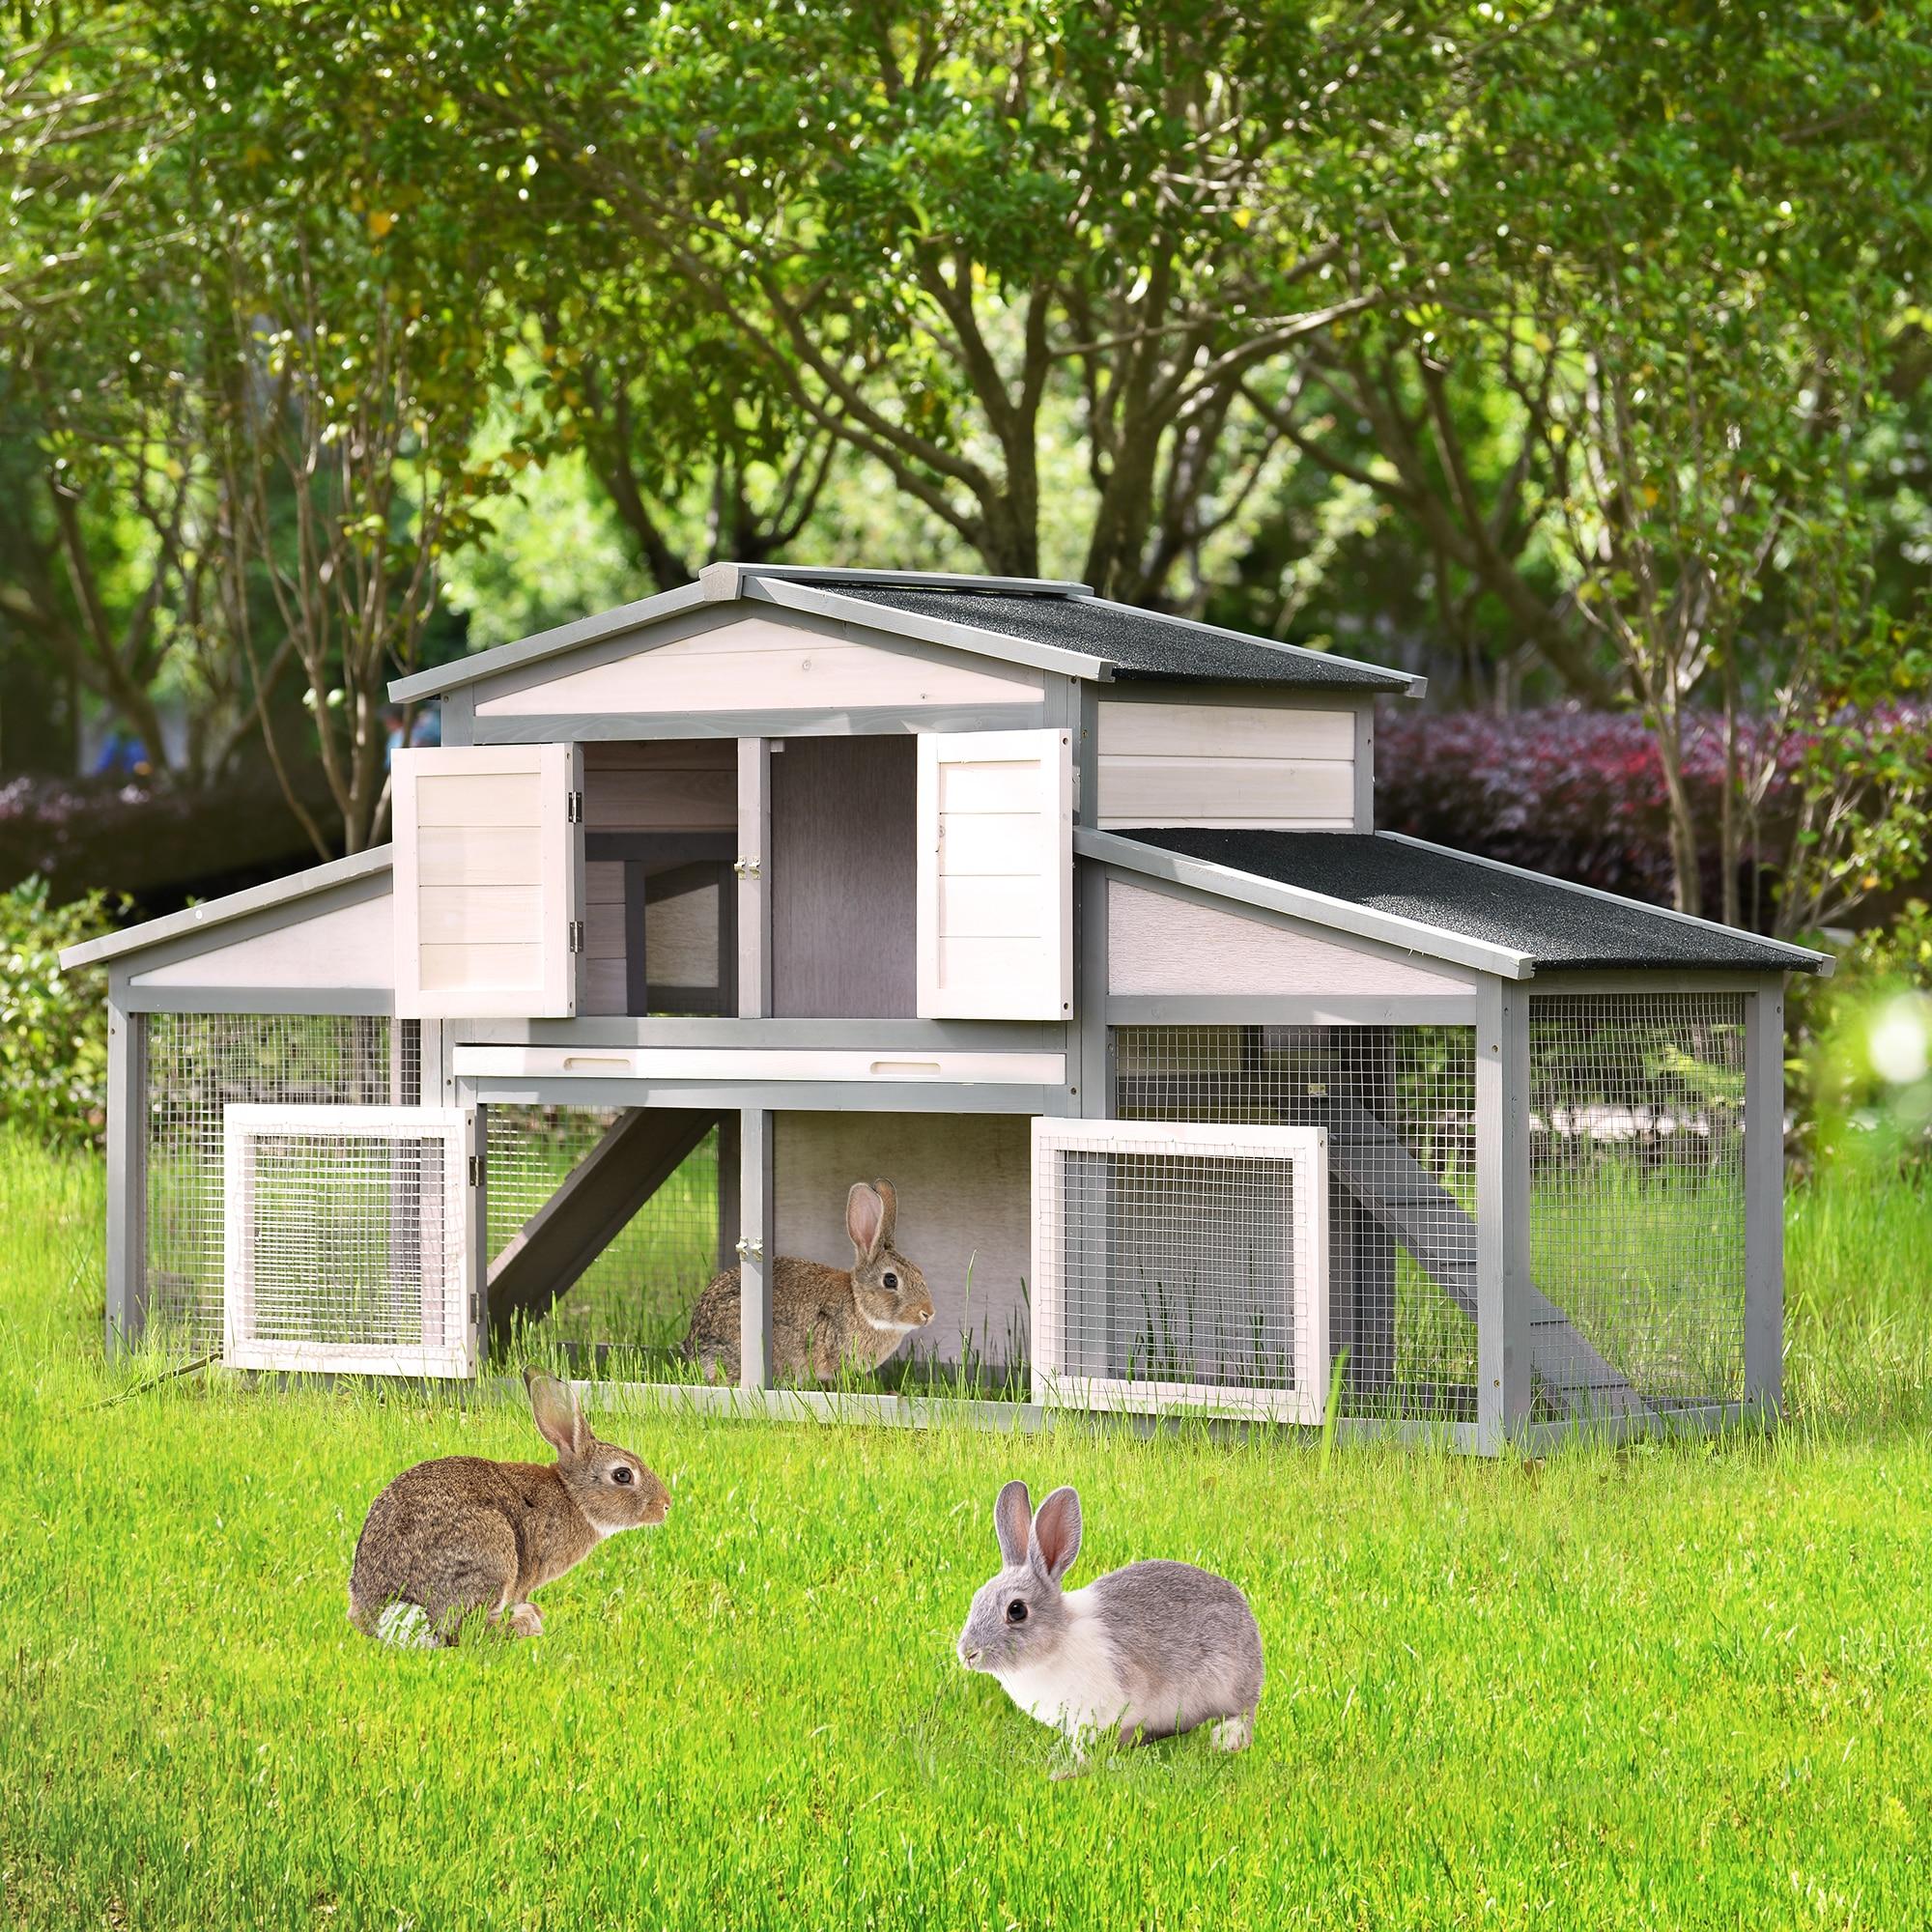 88x28x43In ترقية خشبي كبير قفص الدجاج قفص أرانب قفص الحيوانات الأليفة منازل للحيوانات الأليفة الصغيرة ث/صينية و 2 سلالم رمادي أبيض [US-Stock]